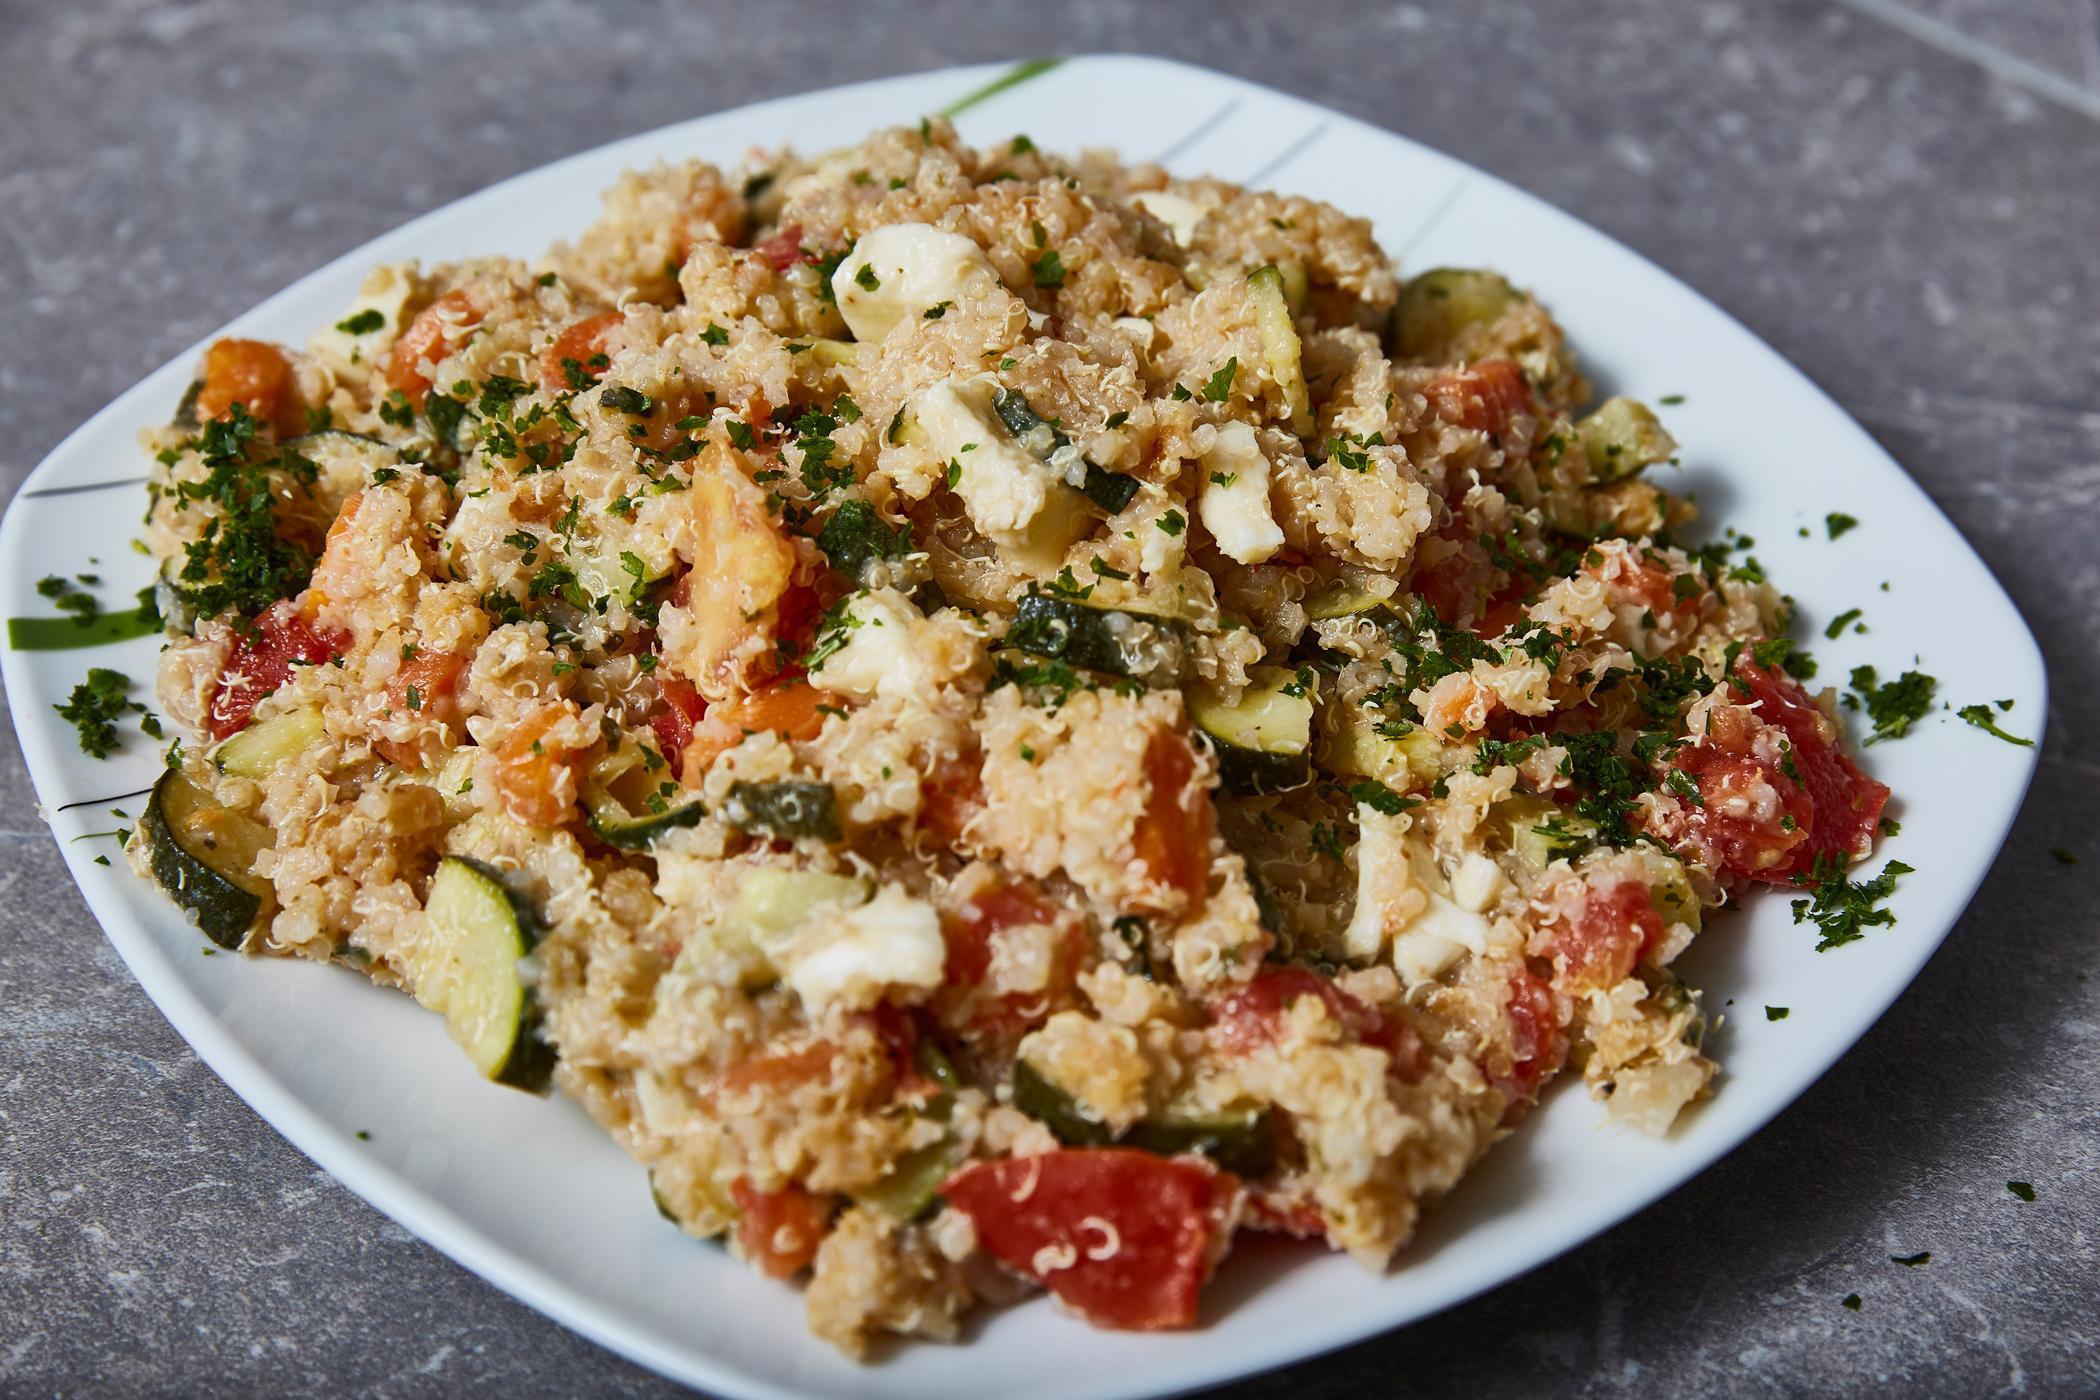 quinoa-Caterina-Salat-Caterina-pogorzelski-Megabambi